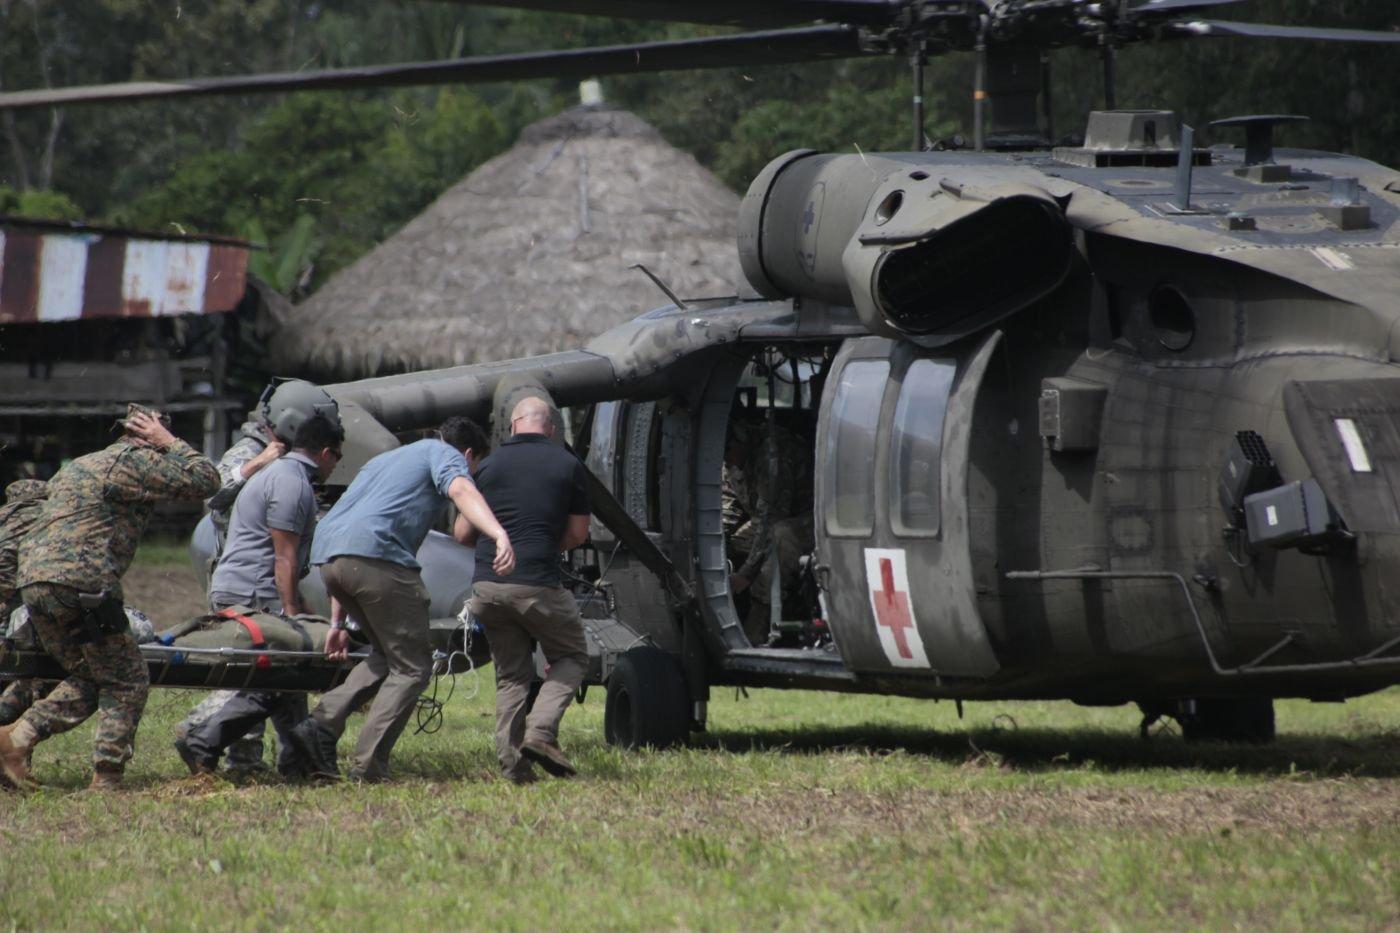 Indigenous Communities of Panama Receive Humanitarian Aid